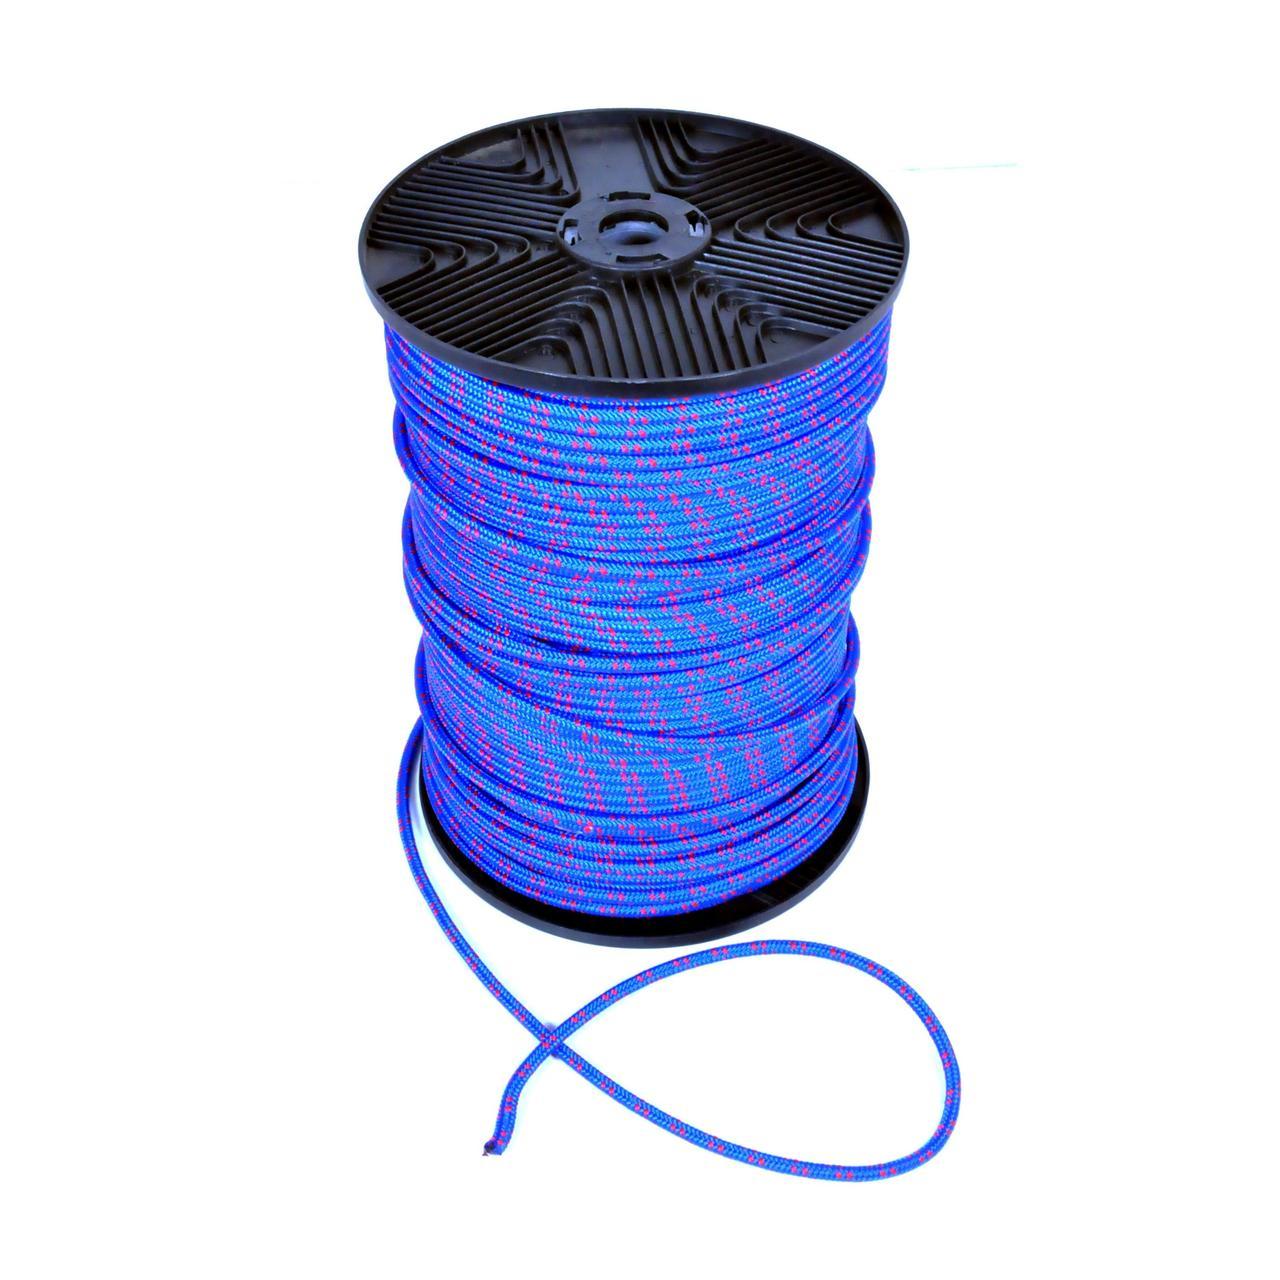 Веревка полипропилен 6мм 200м синяя 85106